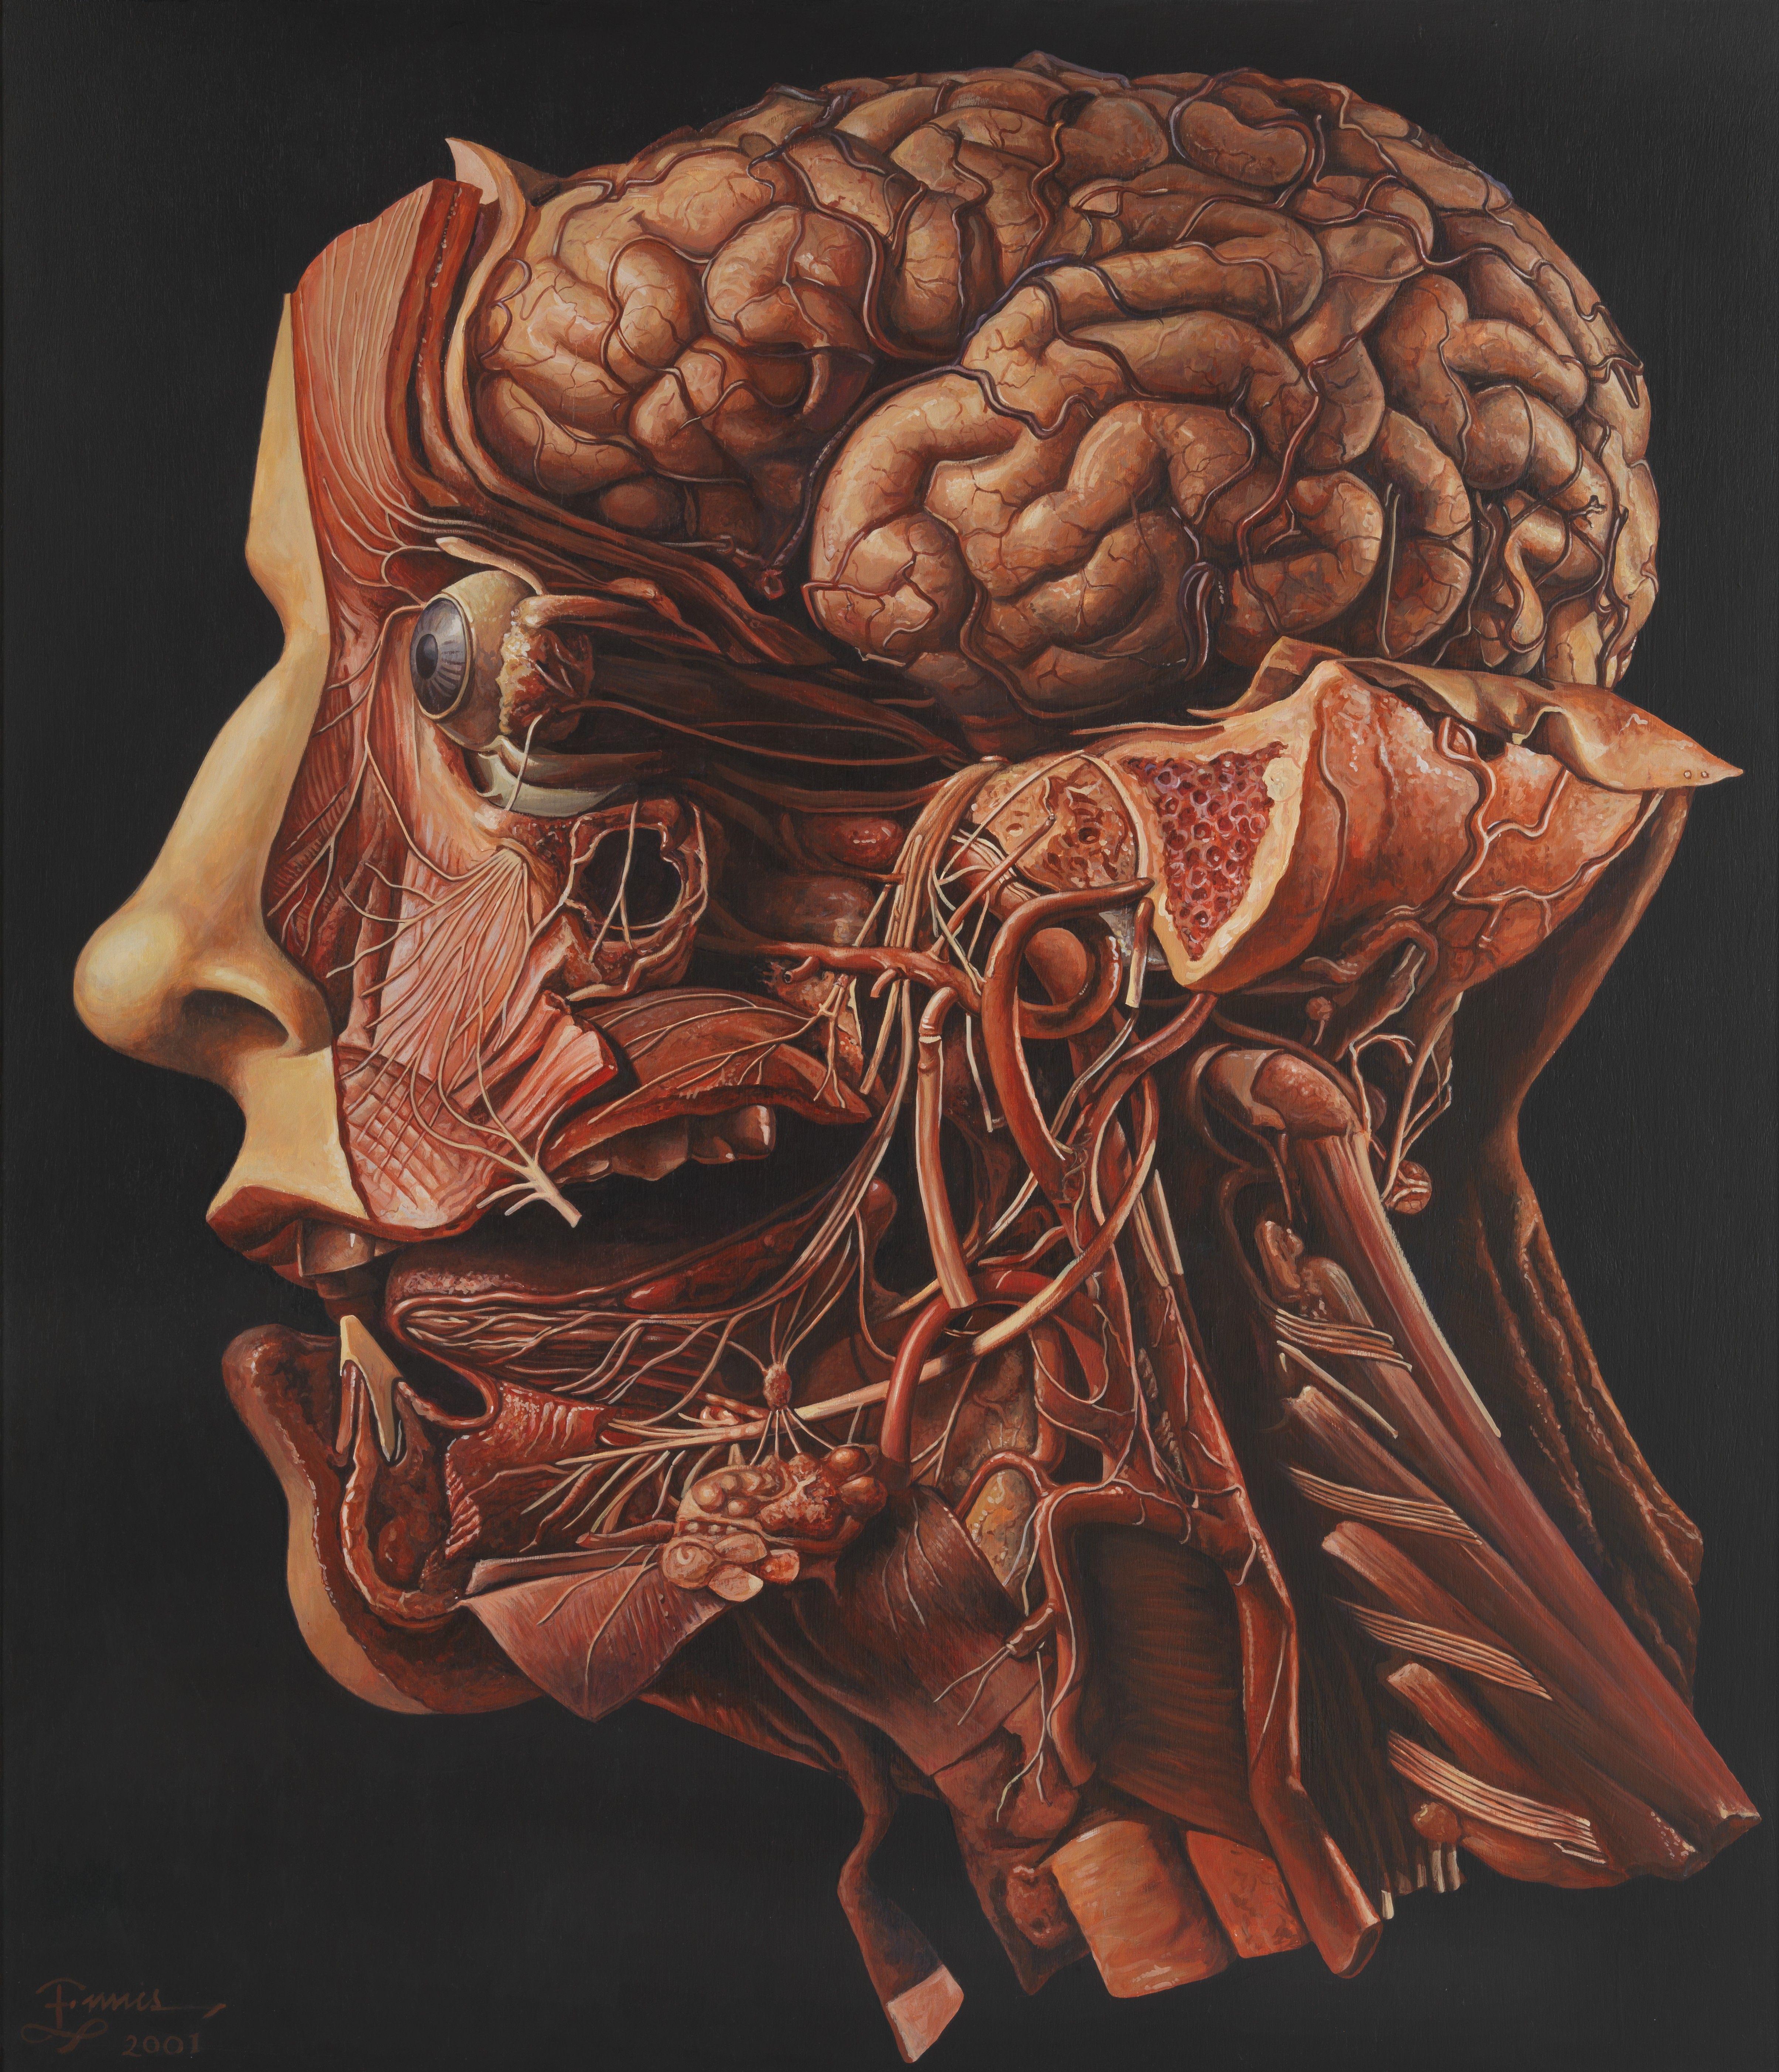 Pin by Howie Schechtman on morbid   Pinterest   Anatomy, Human body ...